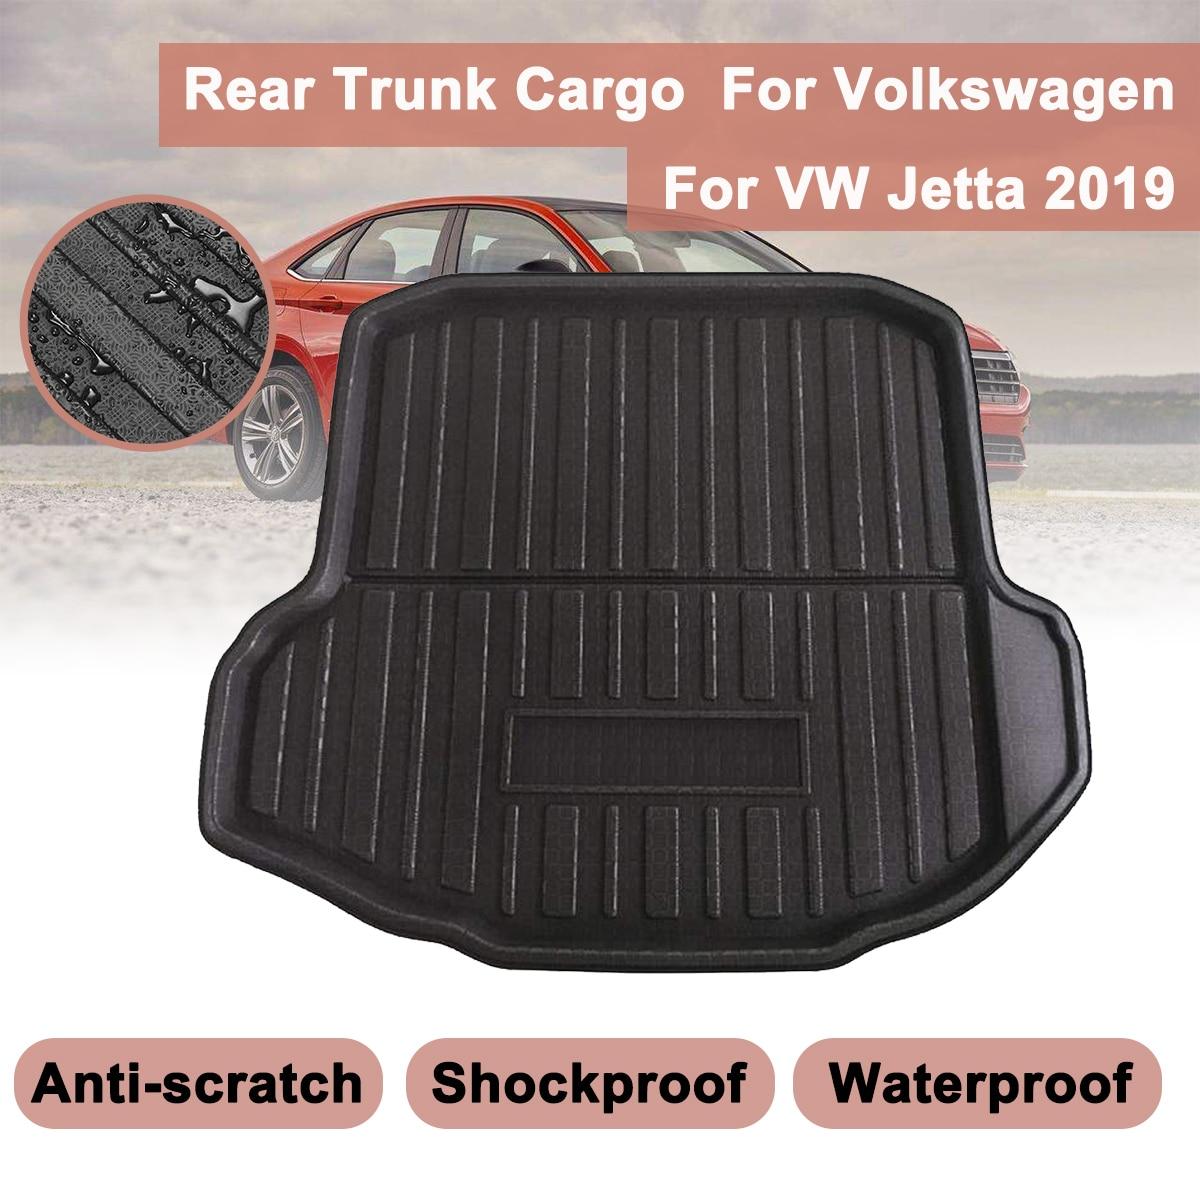 Car Cargo Liner For VW Jetta 2019 Boot For VolkswagenTray Rear Trunk Cover Matt Mat Floor Carpet Kick Pad Mat